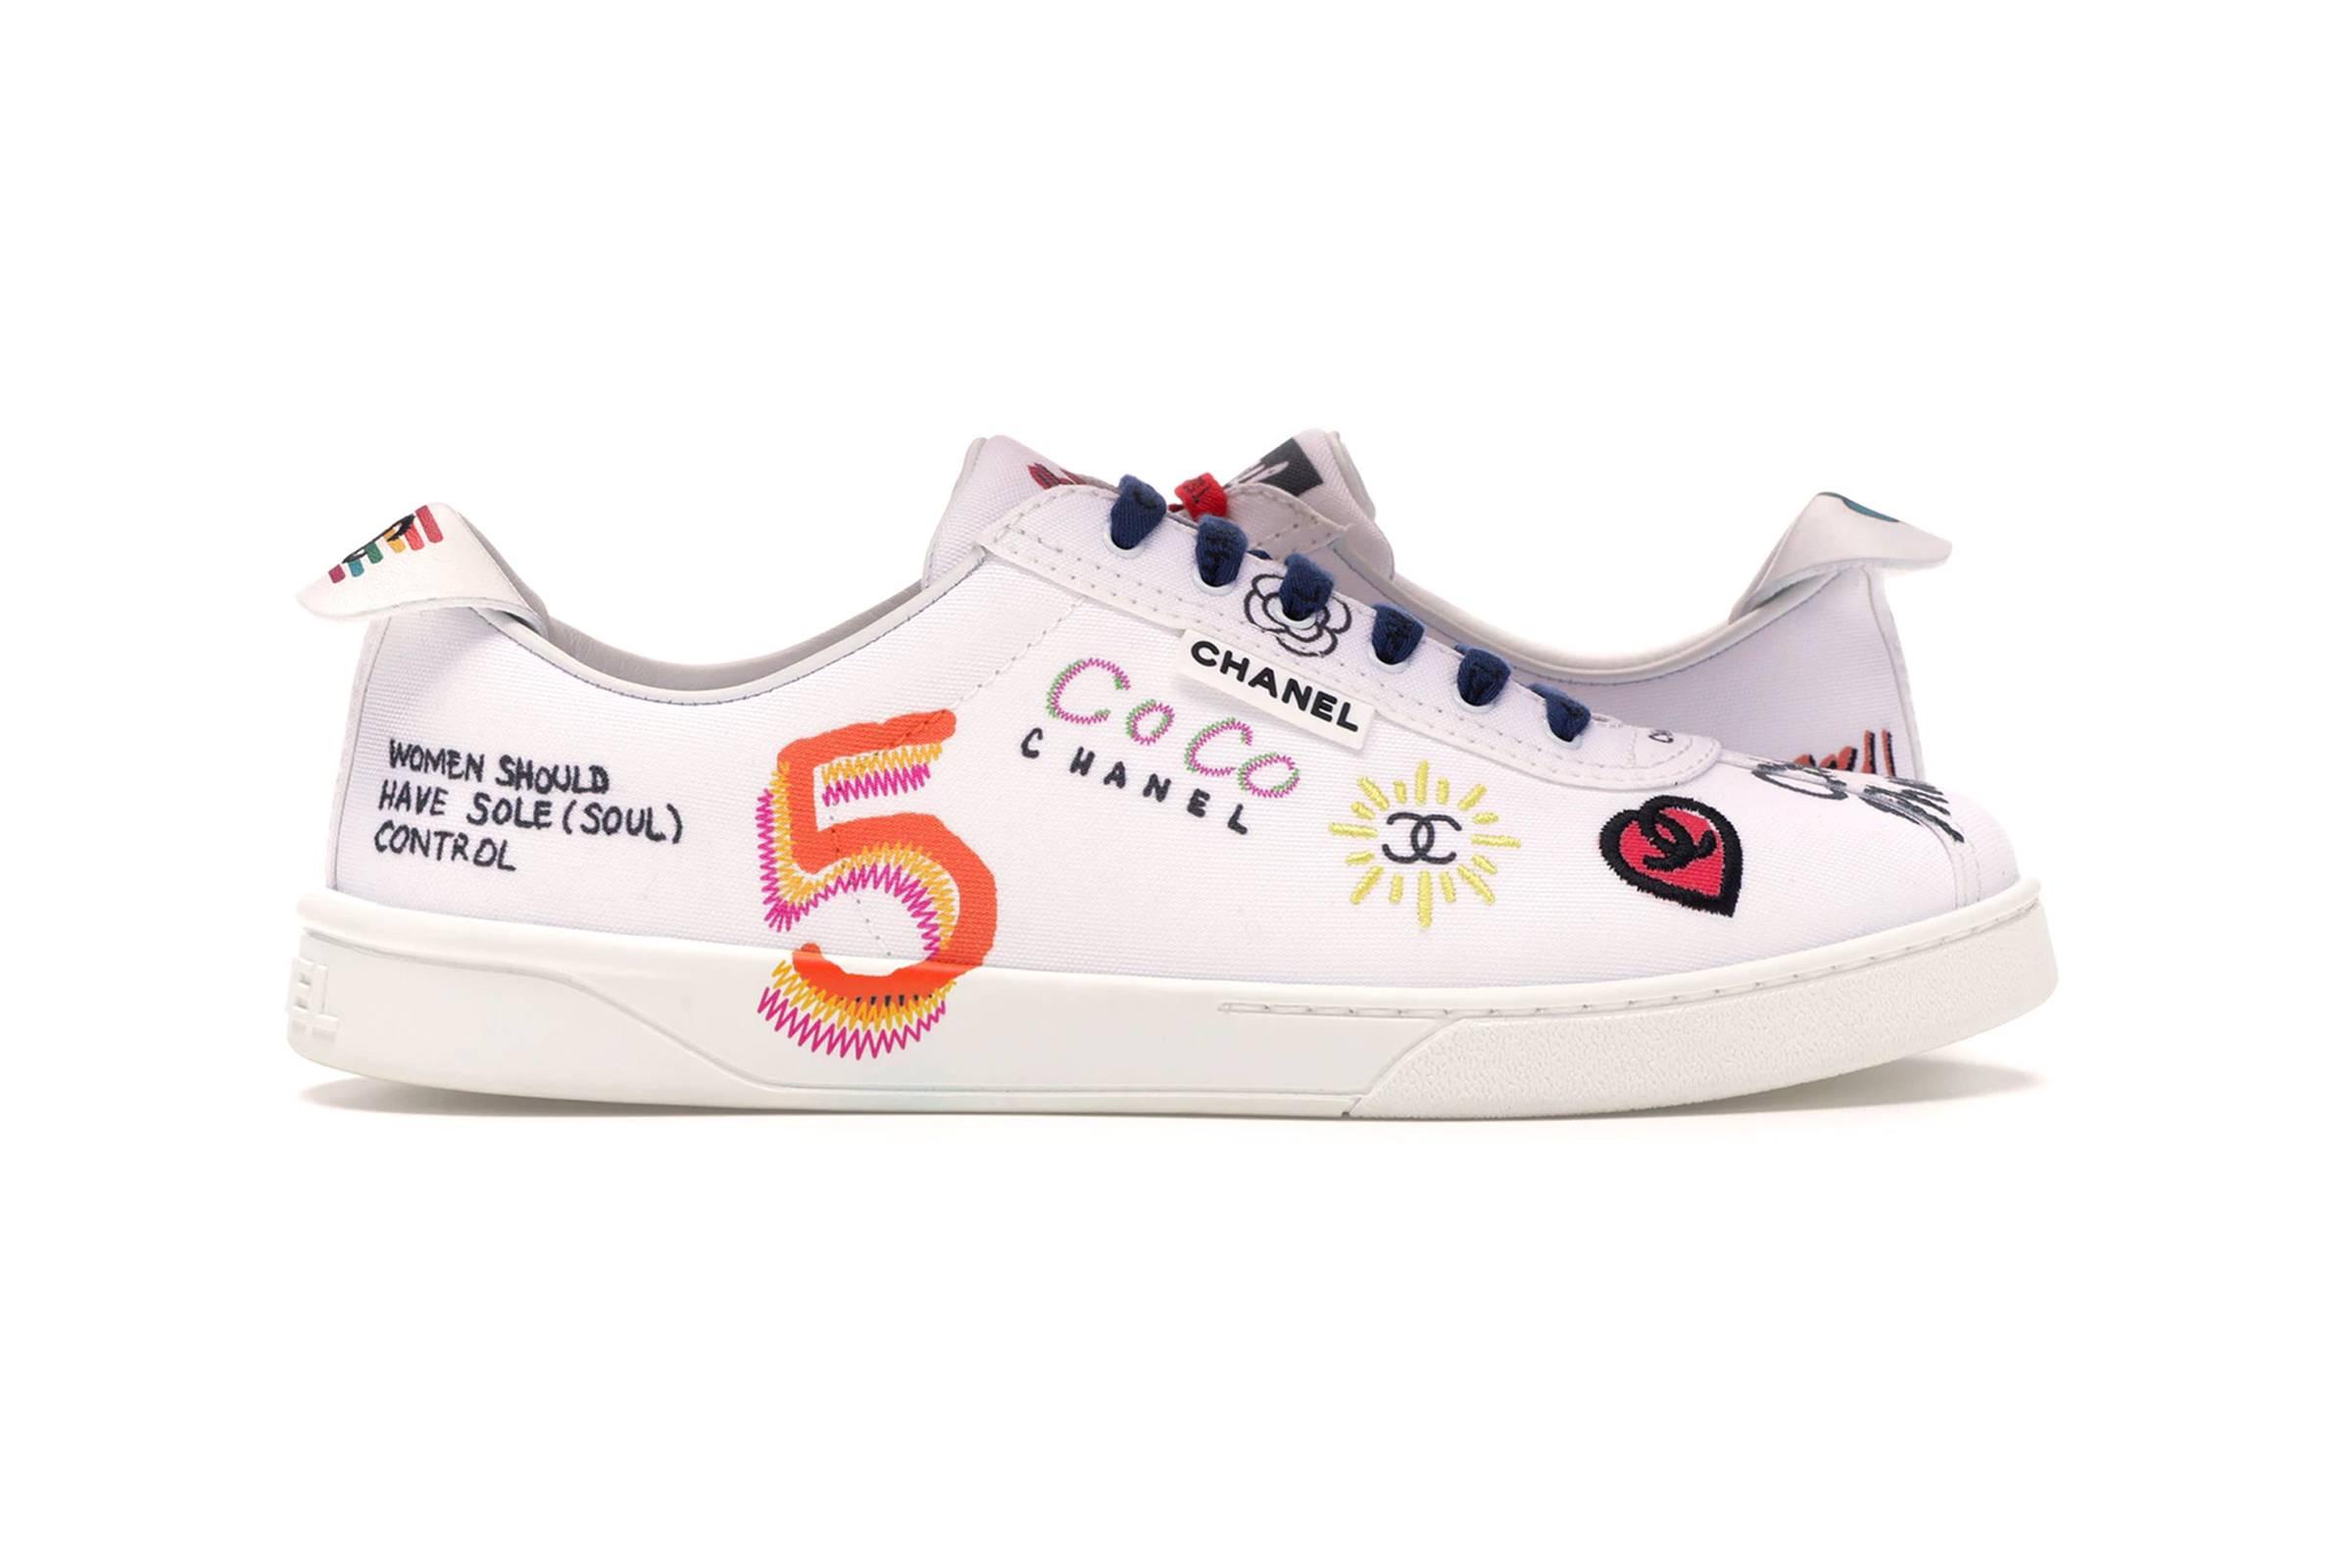 Pharrell x Chanel Sneakers